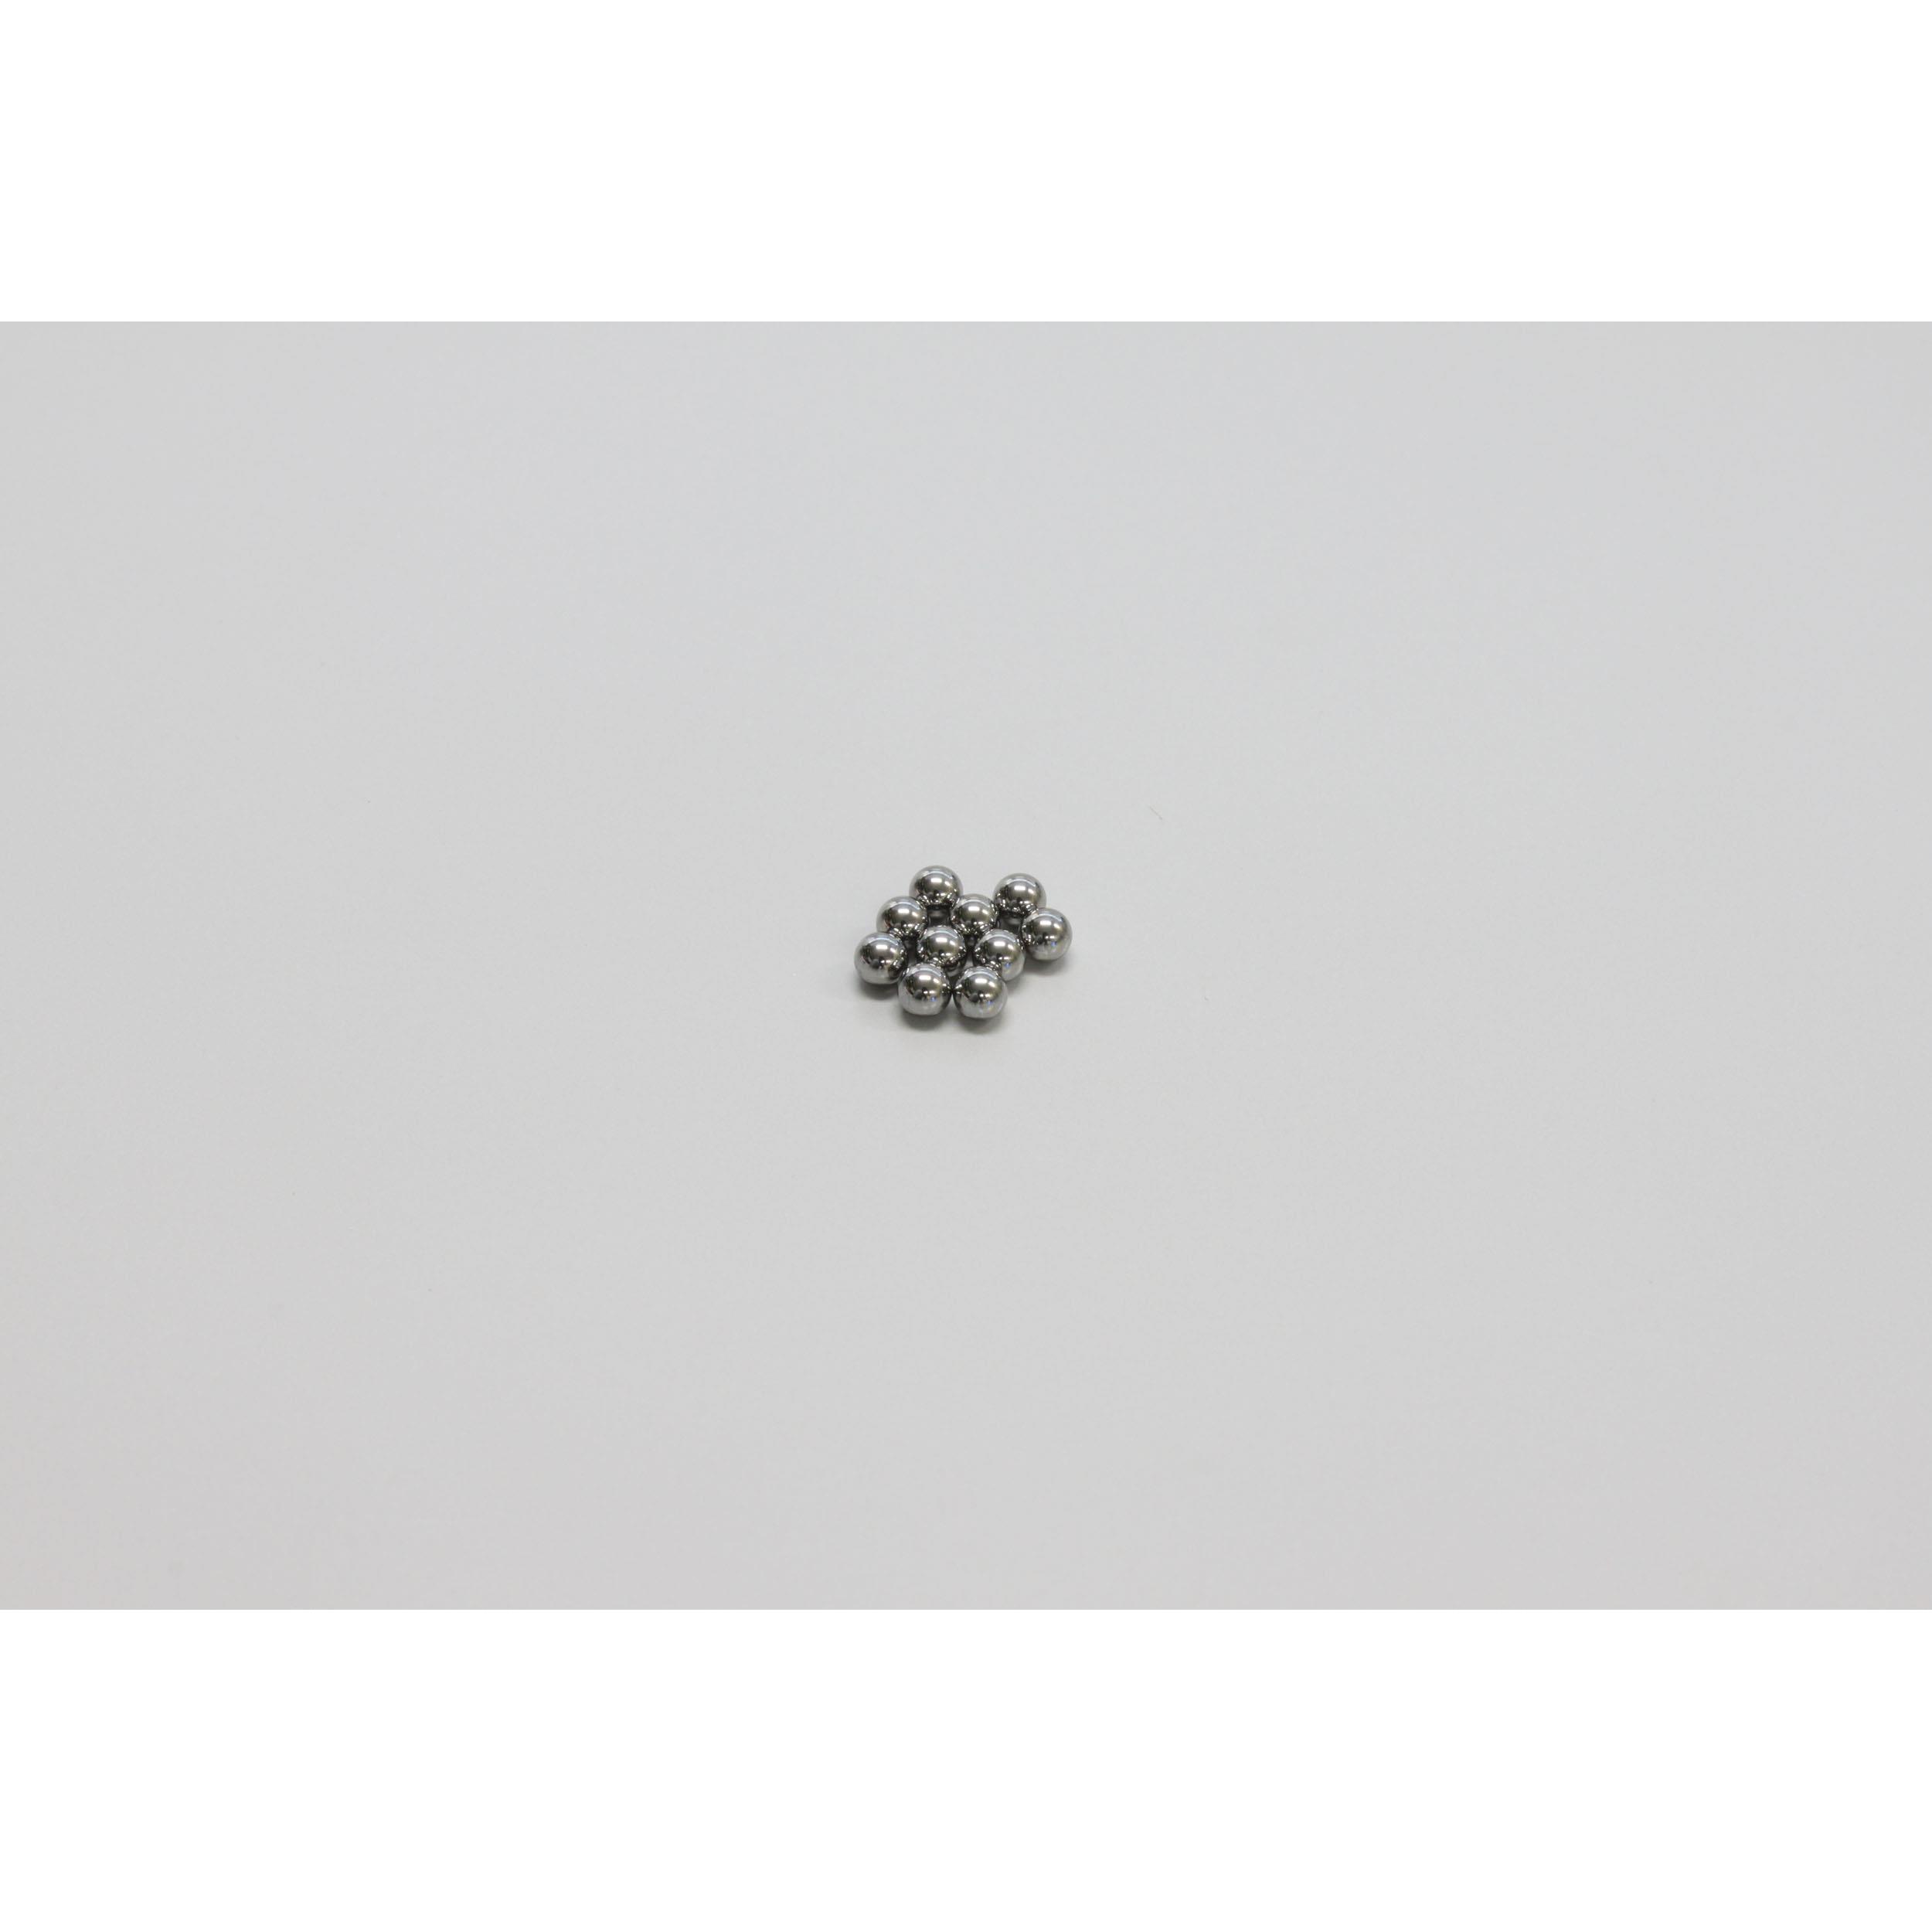 SD017 Diff.Ball 1 8 Inch 10Pcs SPADA